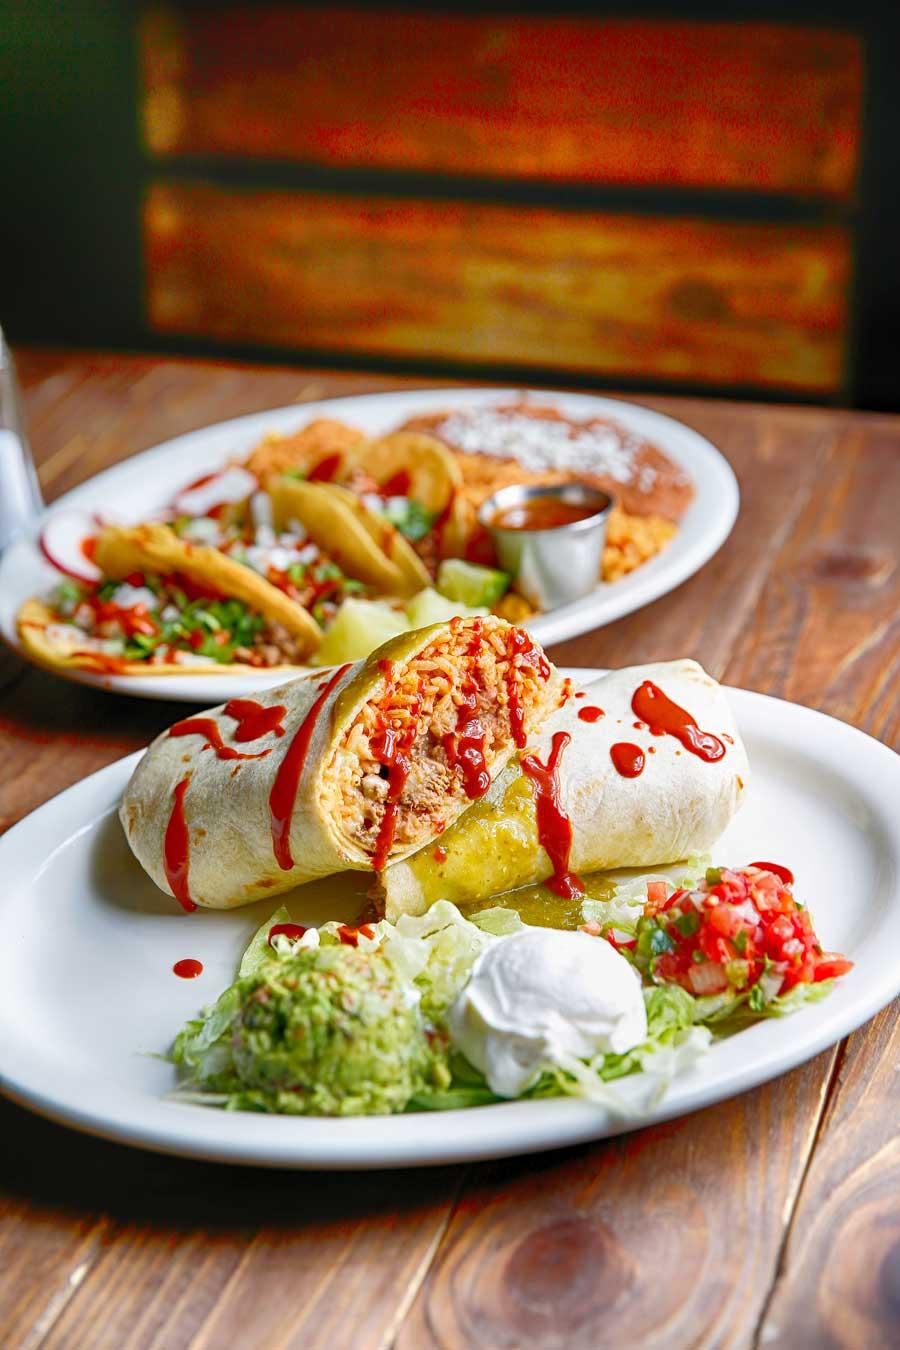 EDUARDO'S LOKOS TACOS: Crazy Delicious Mexican Food - Lake ...